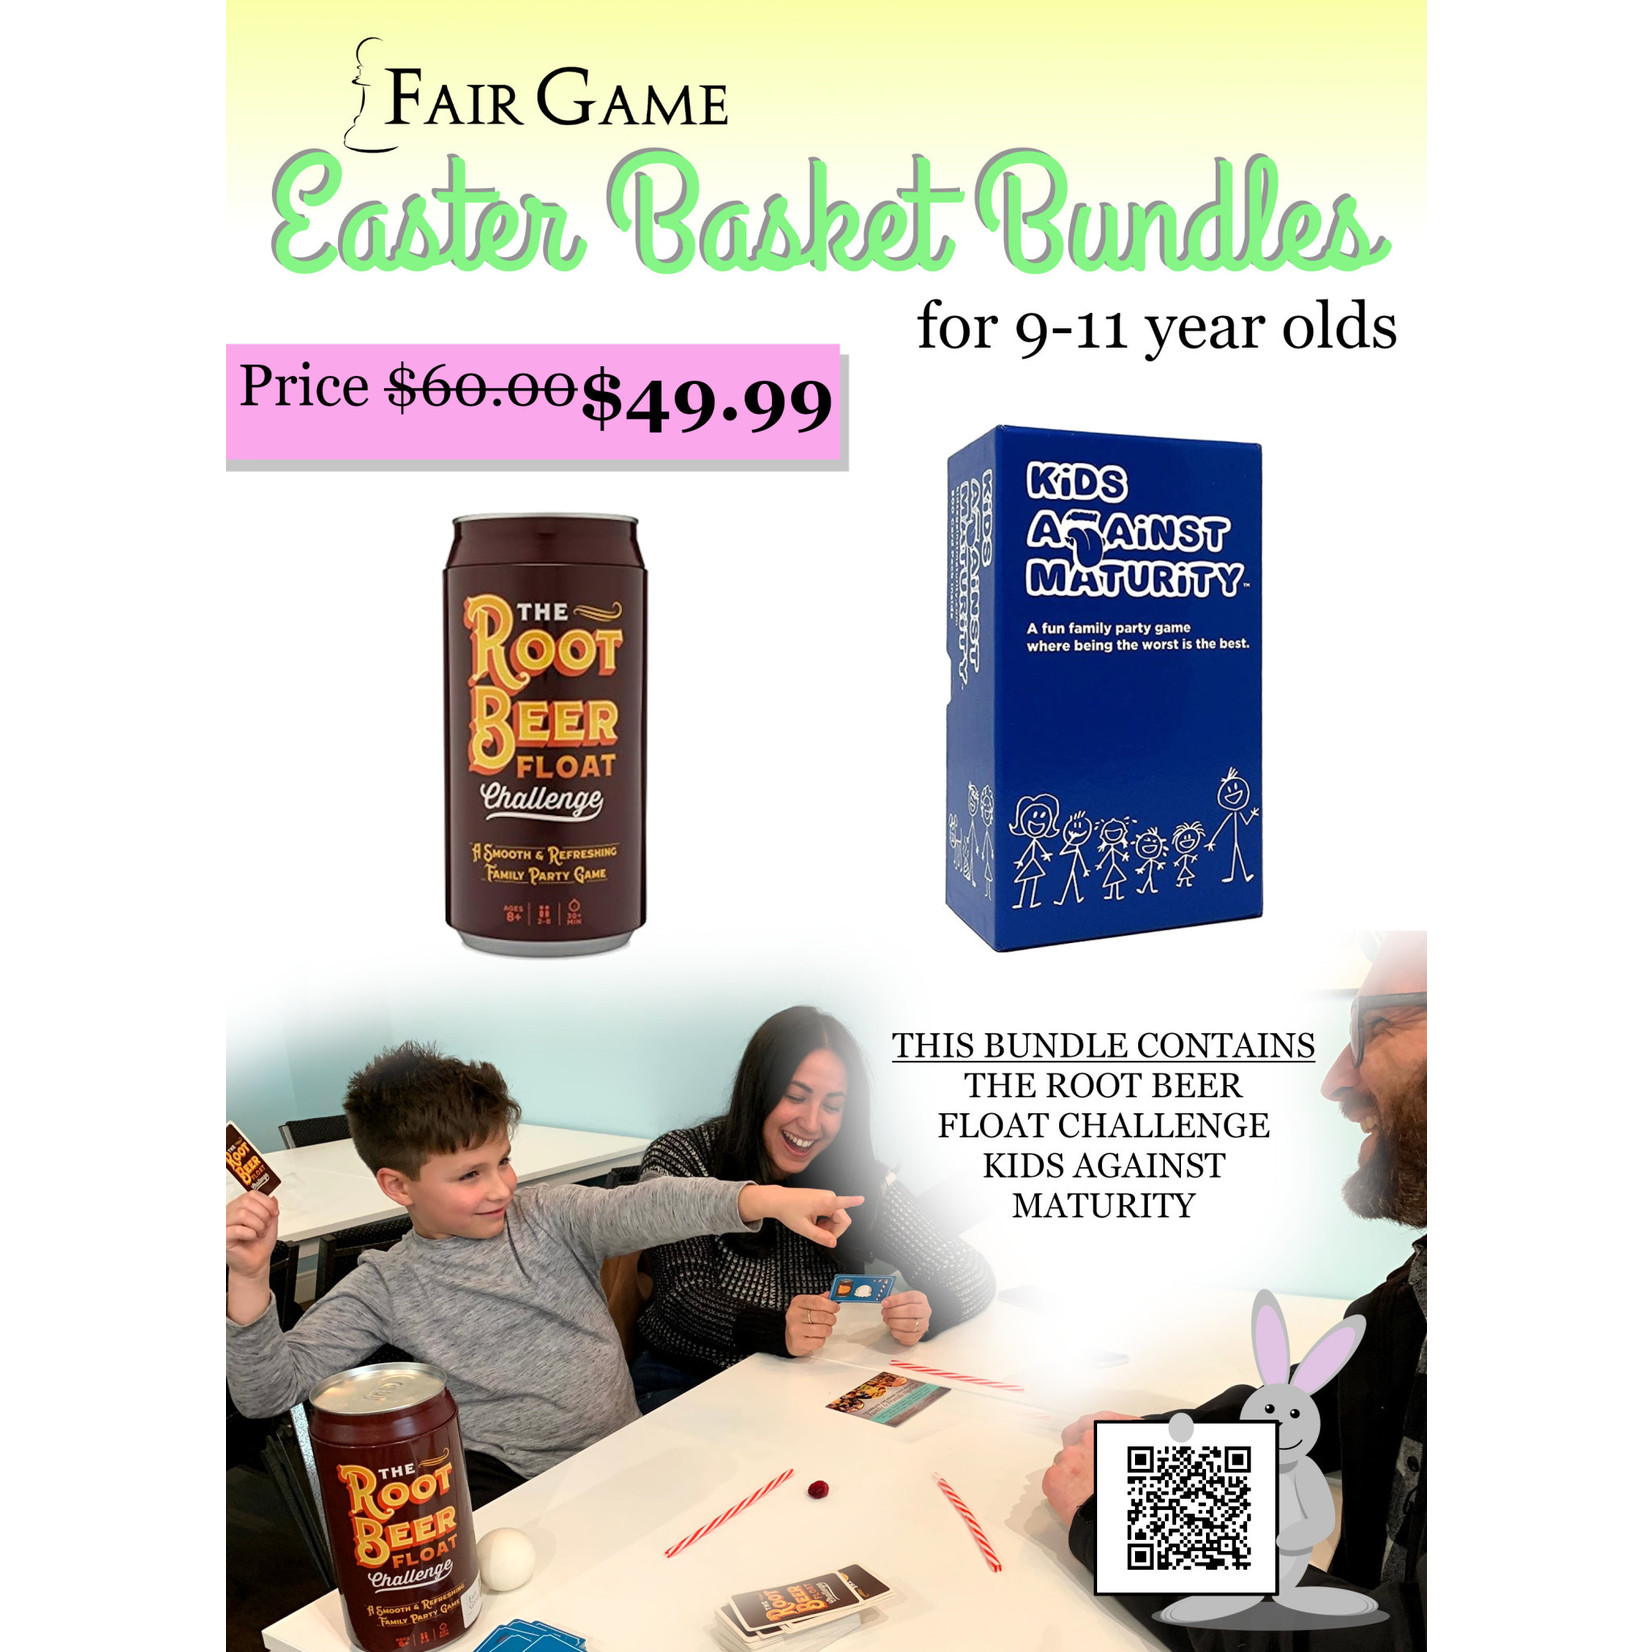 Fair Game Easter Basket Bundle for Ages 9-11